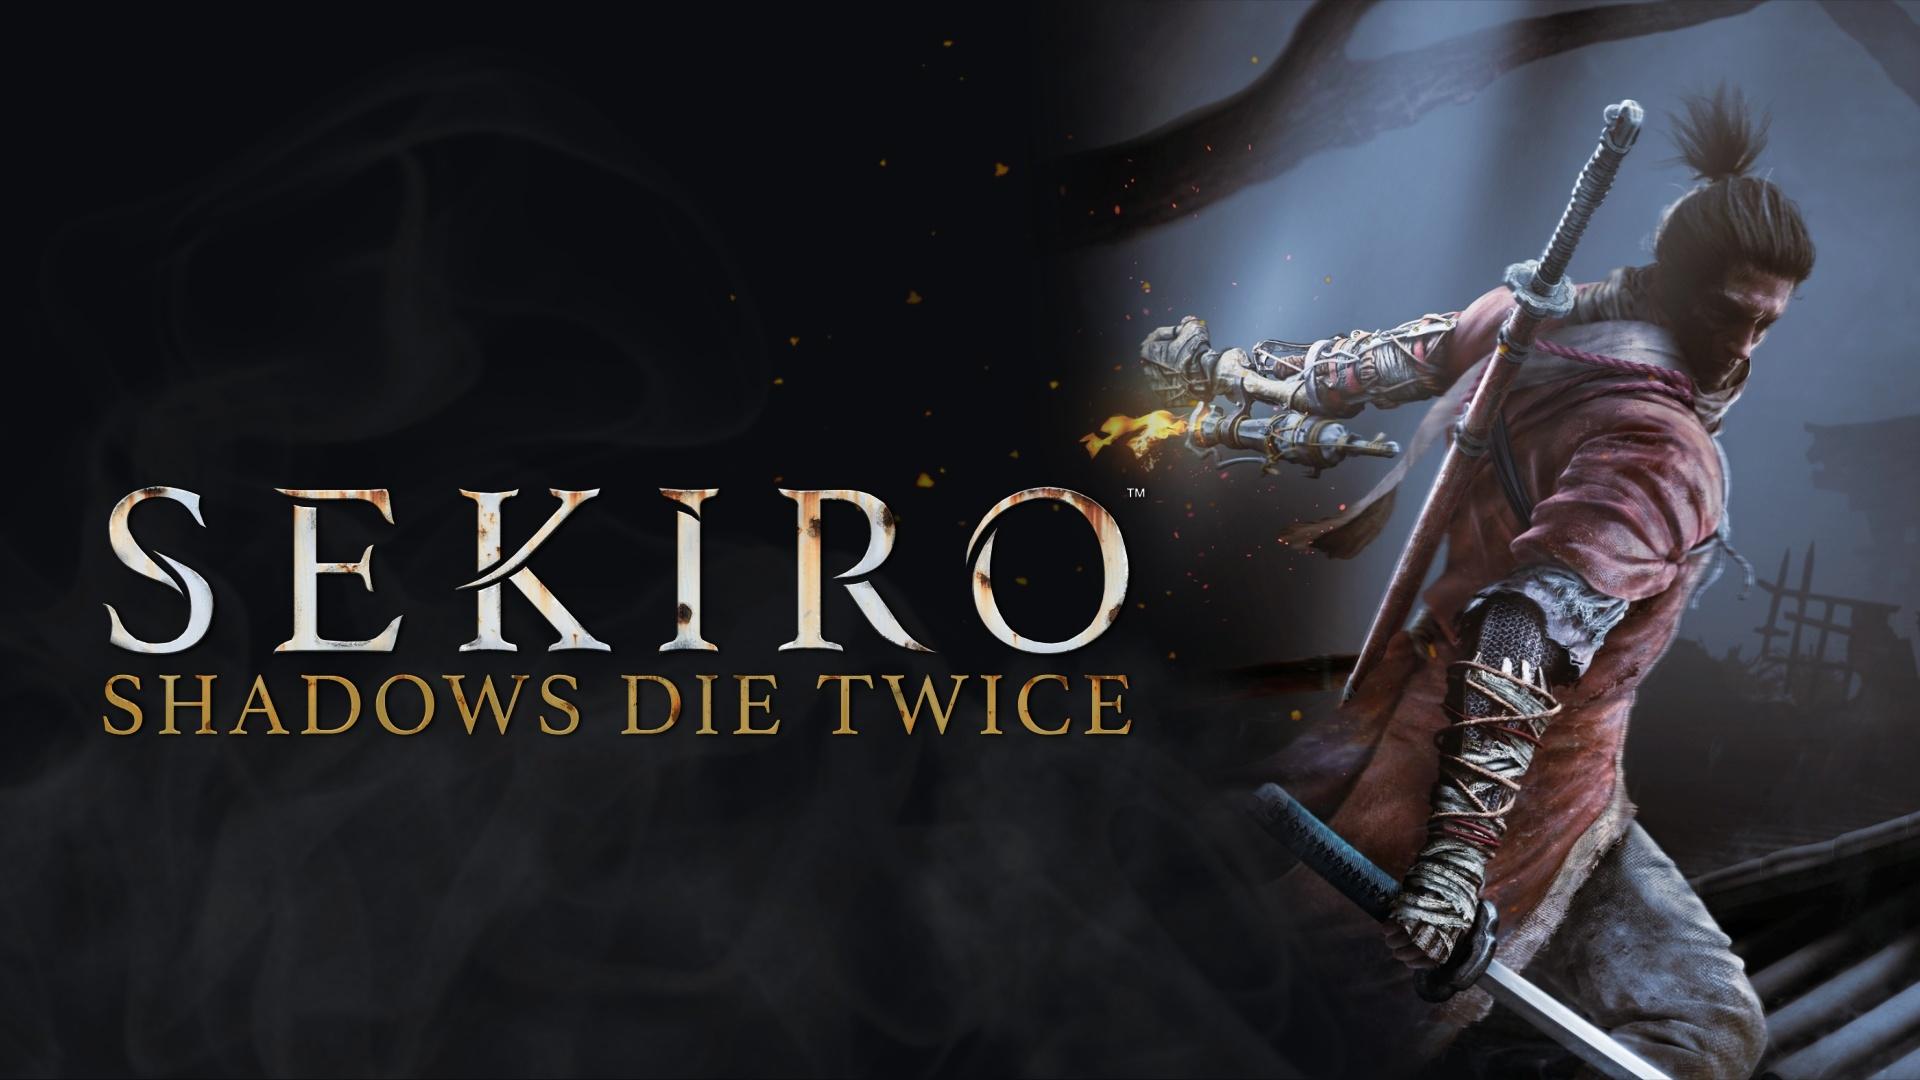 Sekiro Shadows Die Twice Wallpaper By Dralucard On Deviantart